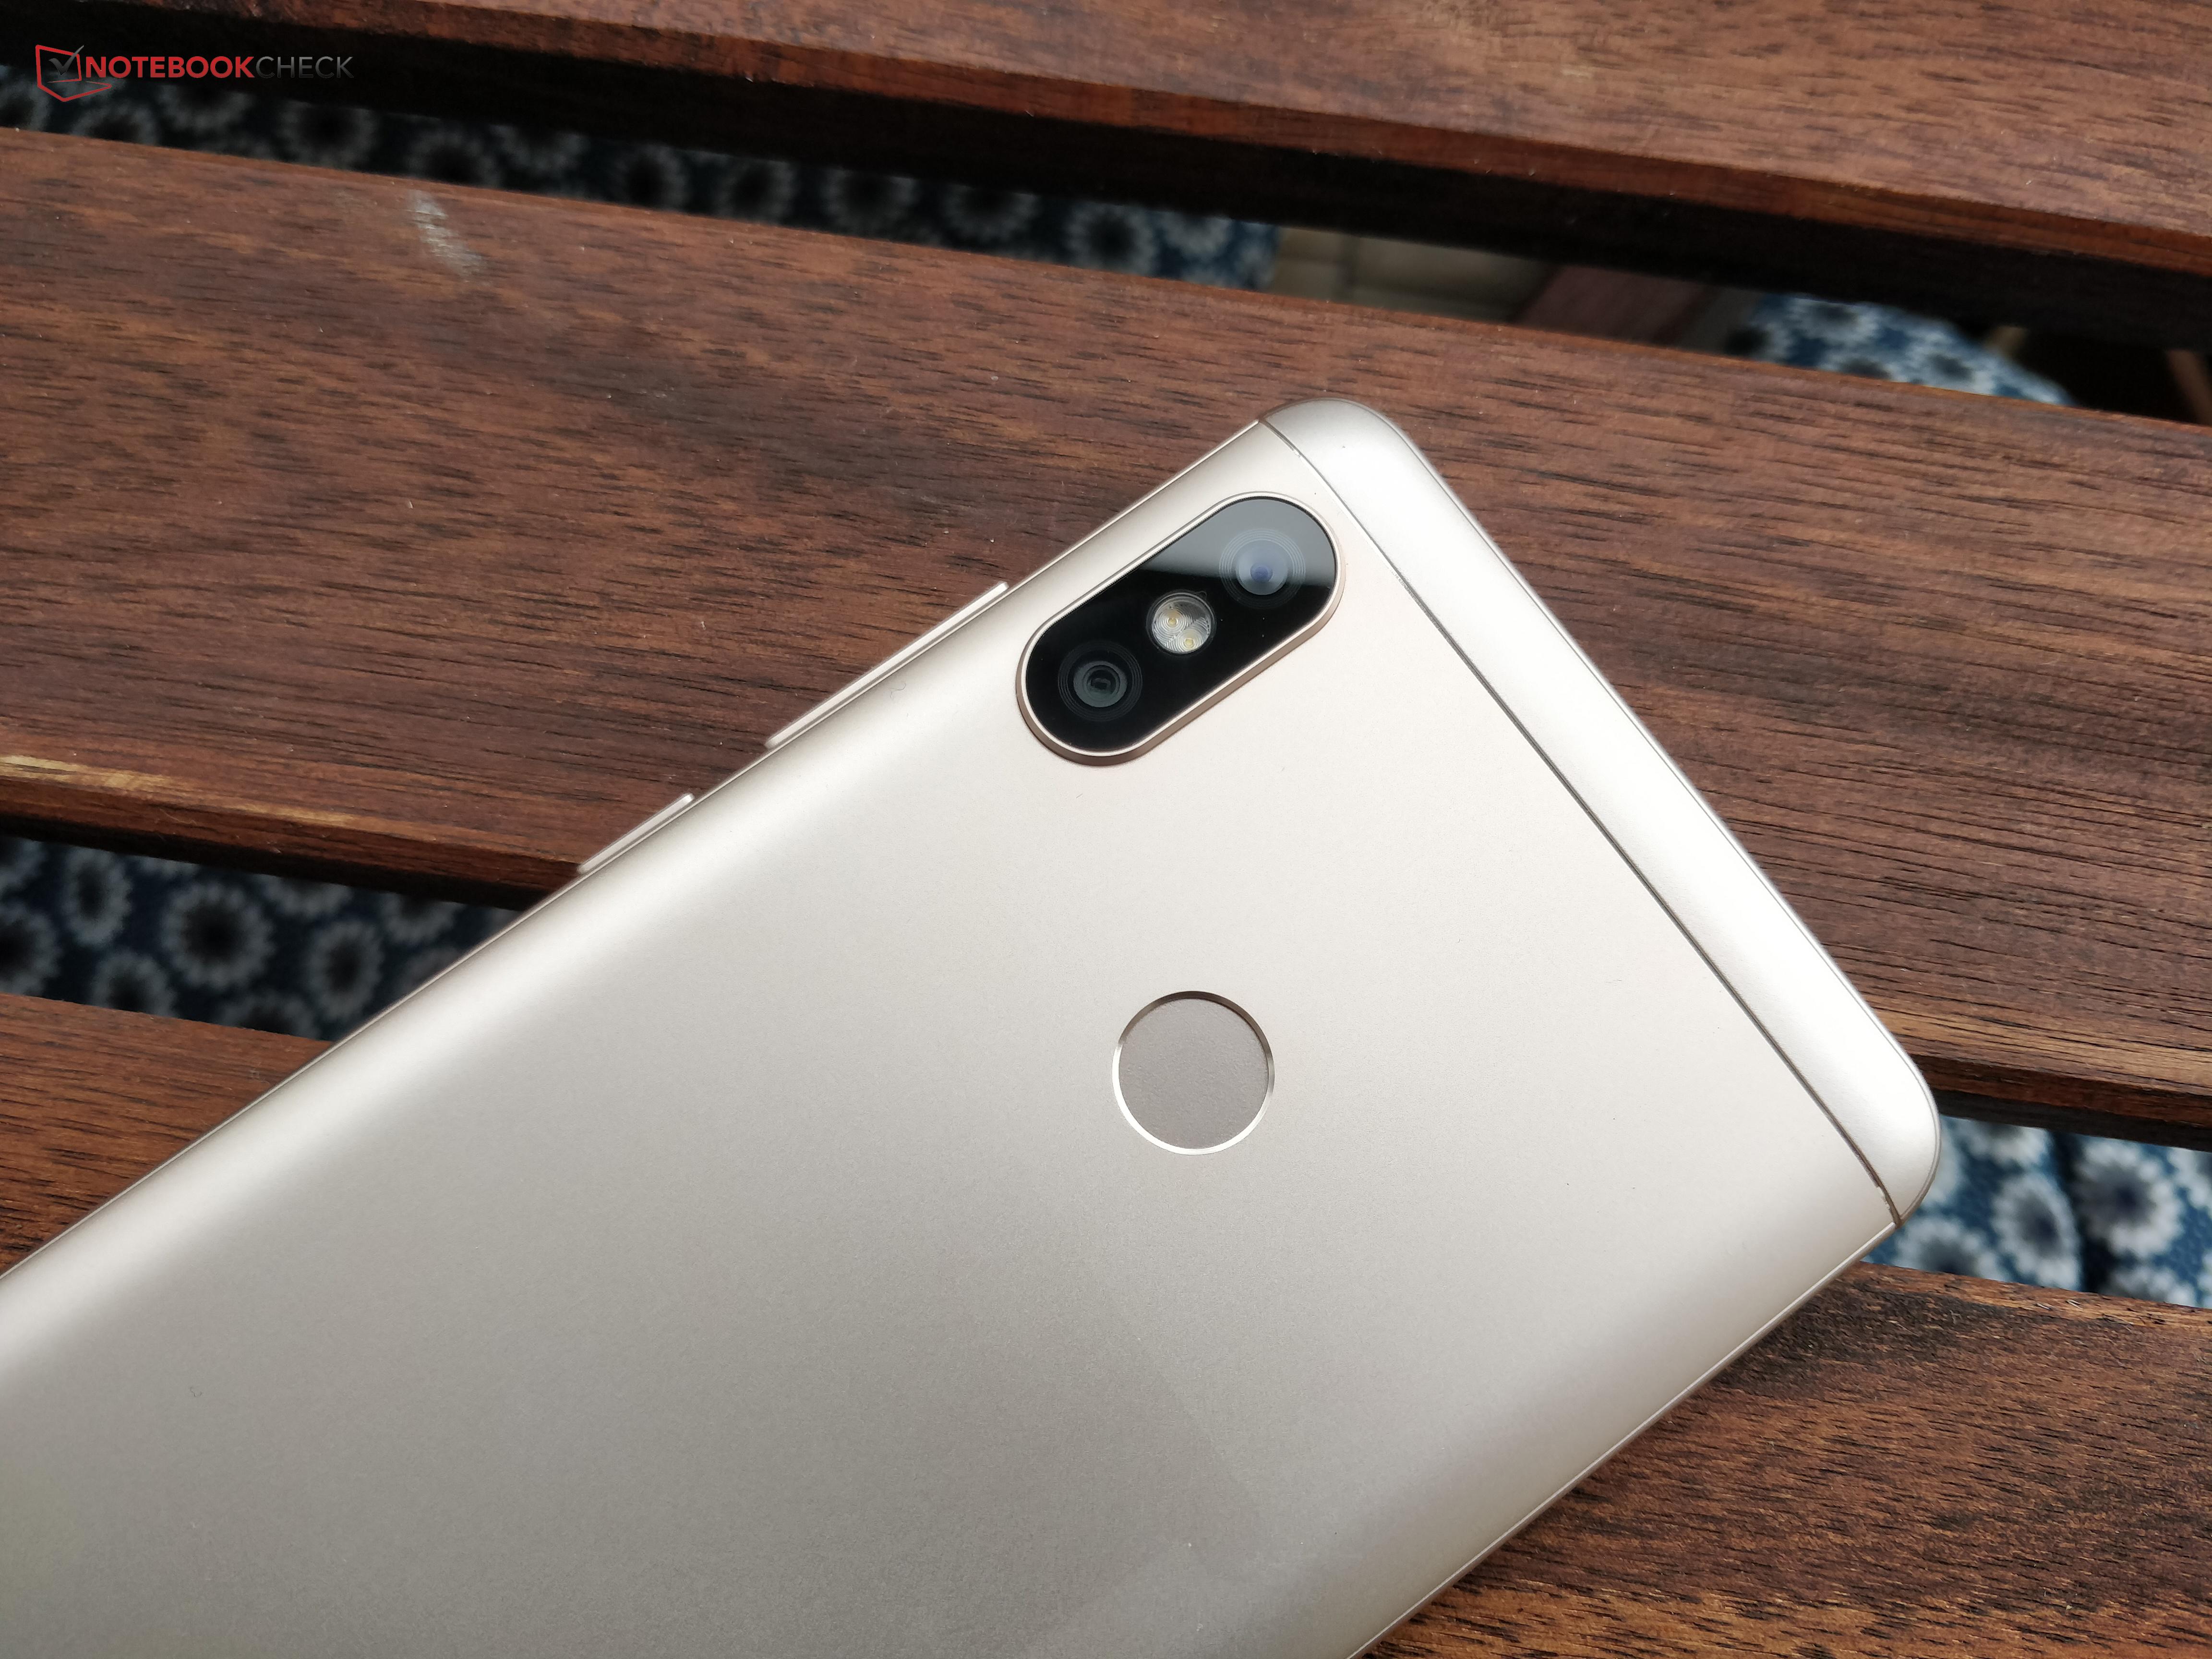 Xiaomi Redmi Note 5 Smartphone Review Reviews Red Mi Note4 Ram 3gb Emmc 64gb Dual Sim 4g Full Resolution